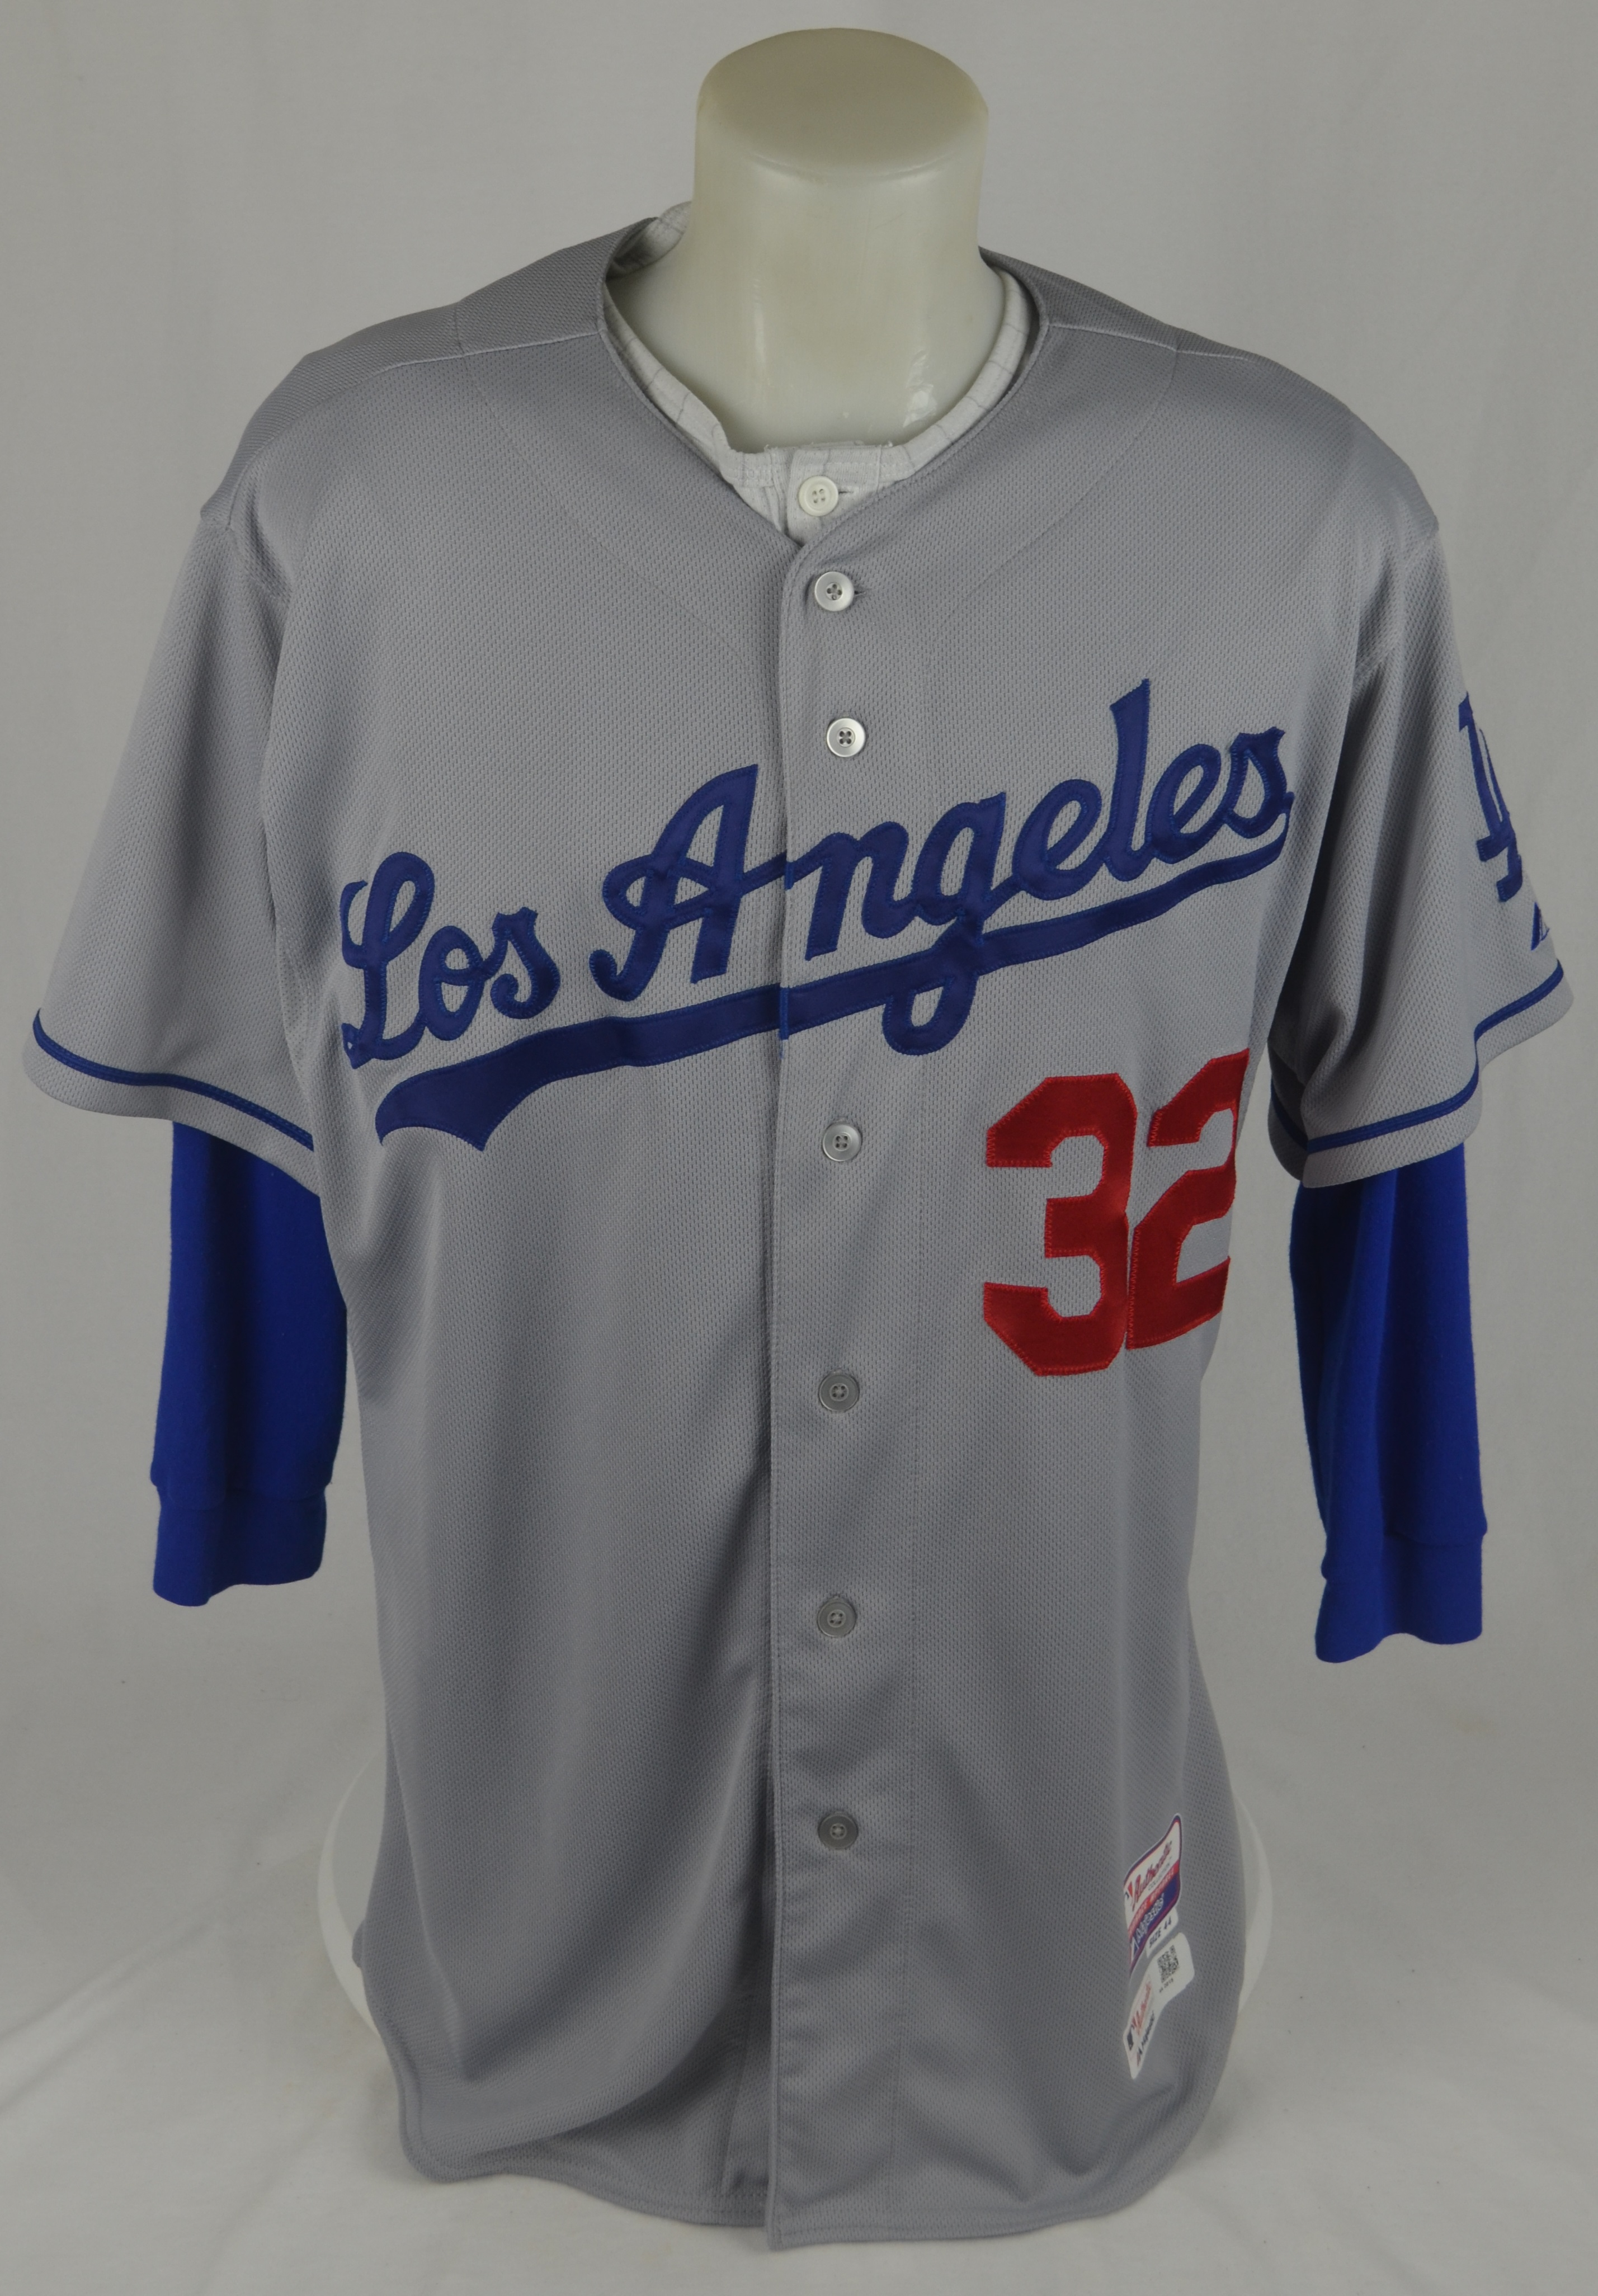 92a9e7c06 ... Sandy Koufax 2015 Los Angeles Dodgers Game Used Jersey w Dave Miedema  LOA ...